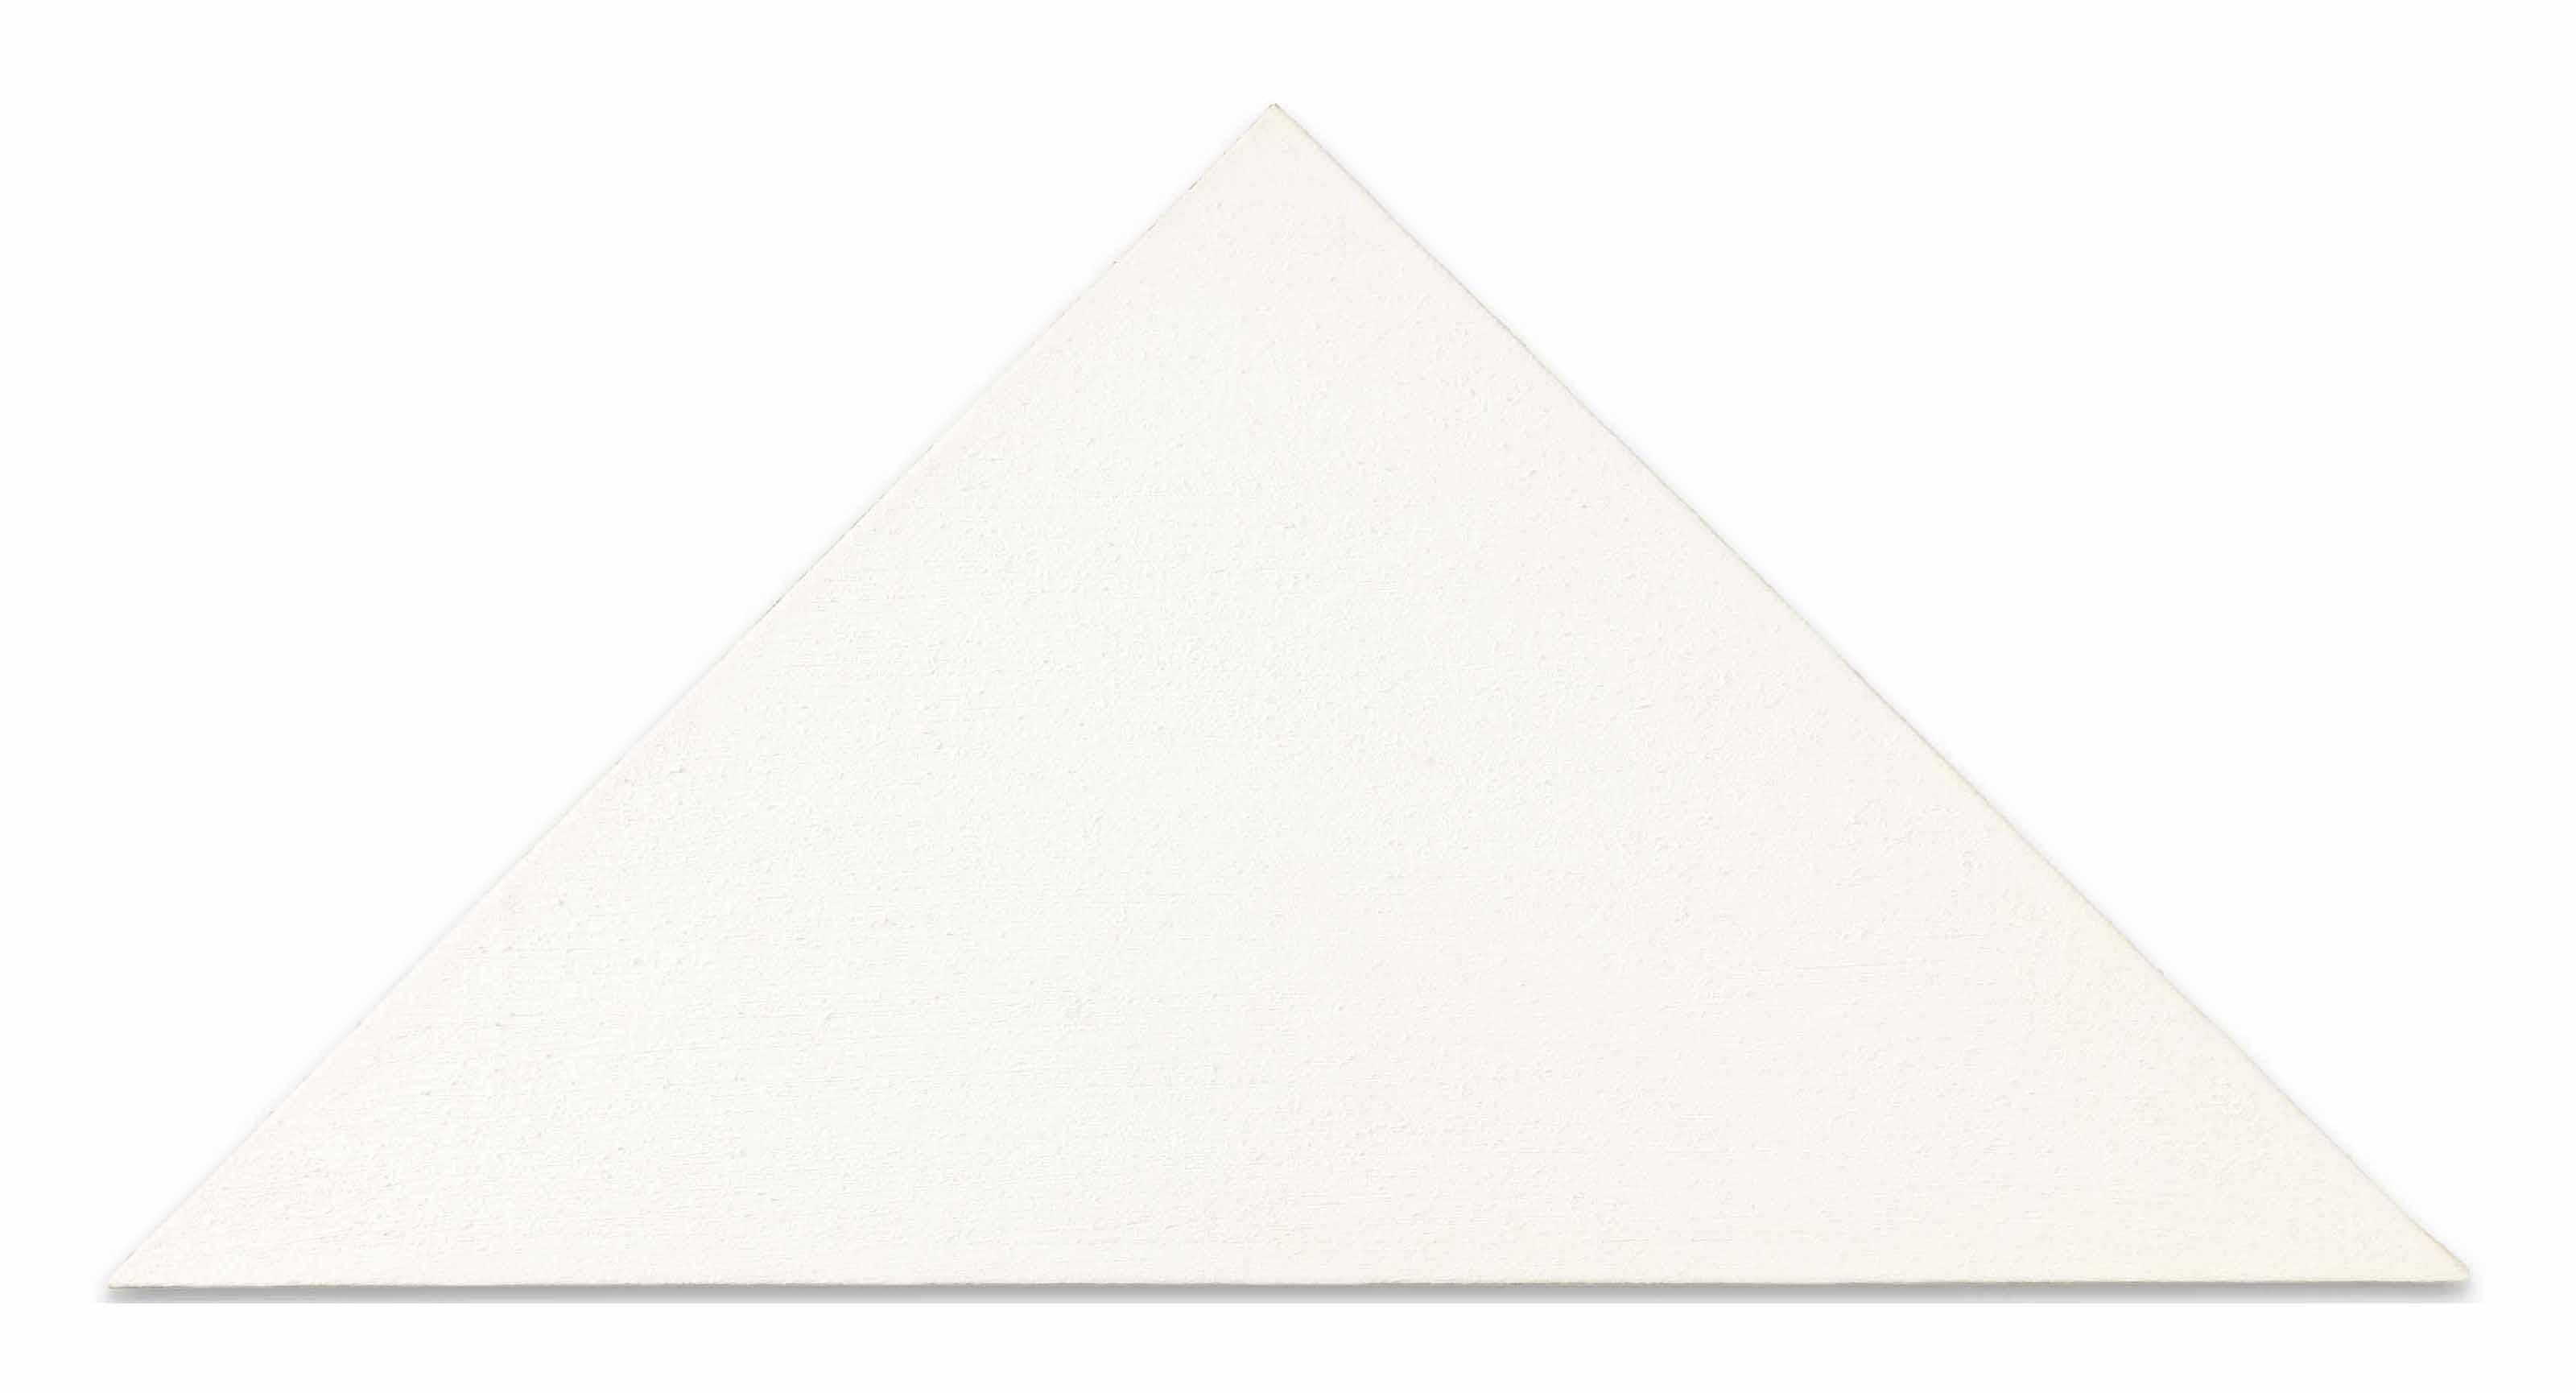 Ohne Titel (Weisses Dreieck) [Untitled (White Triangle)]